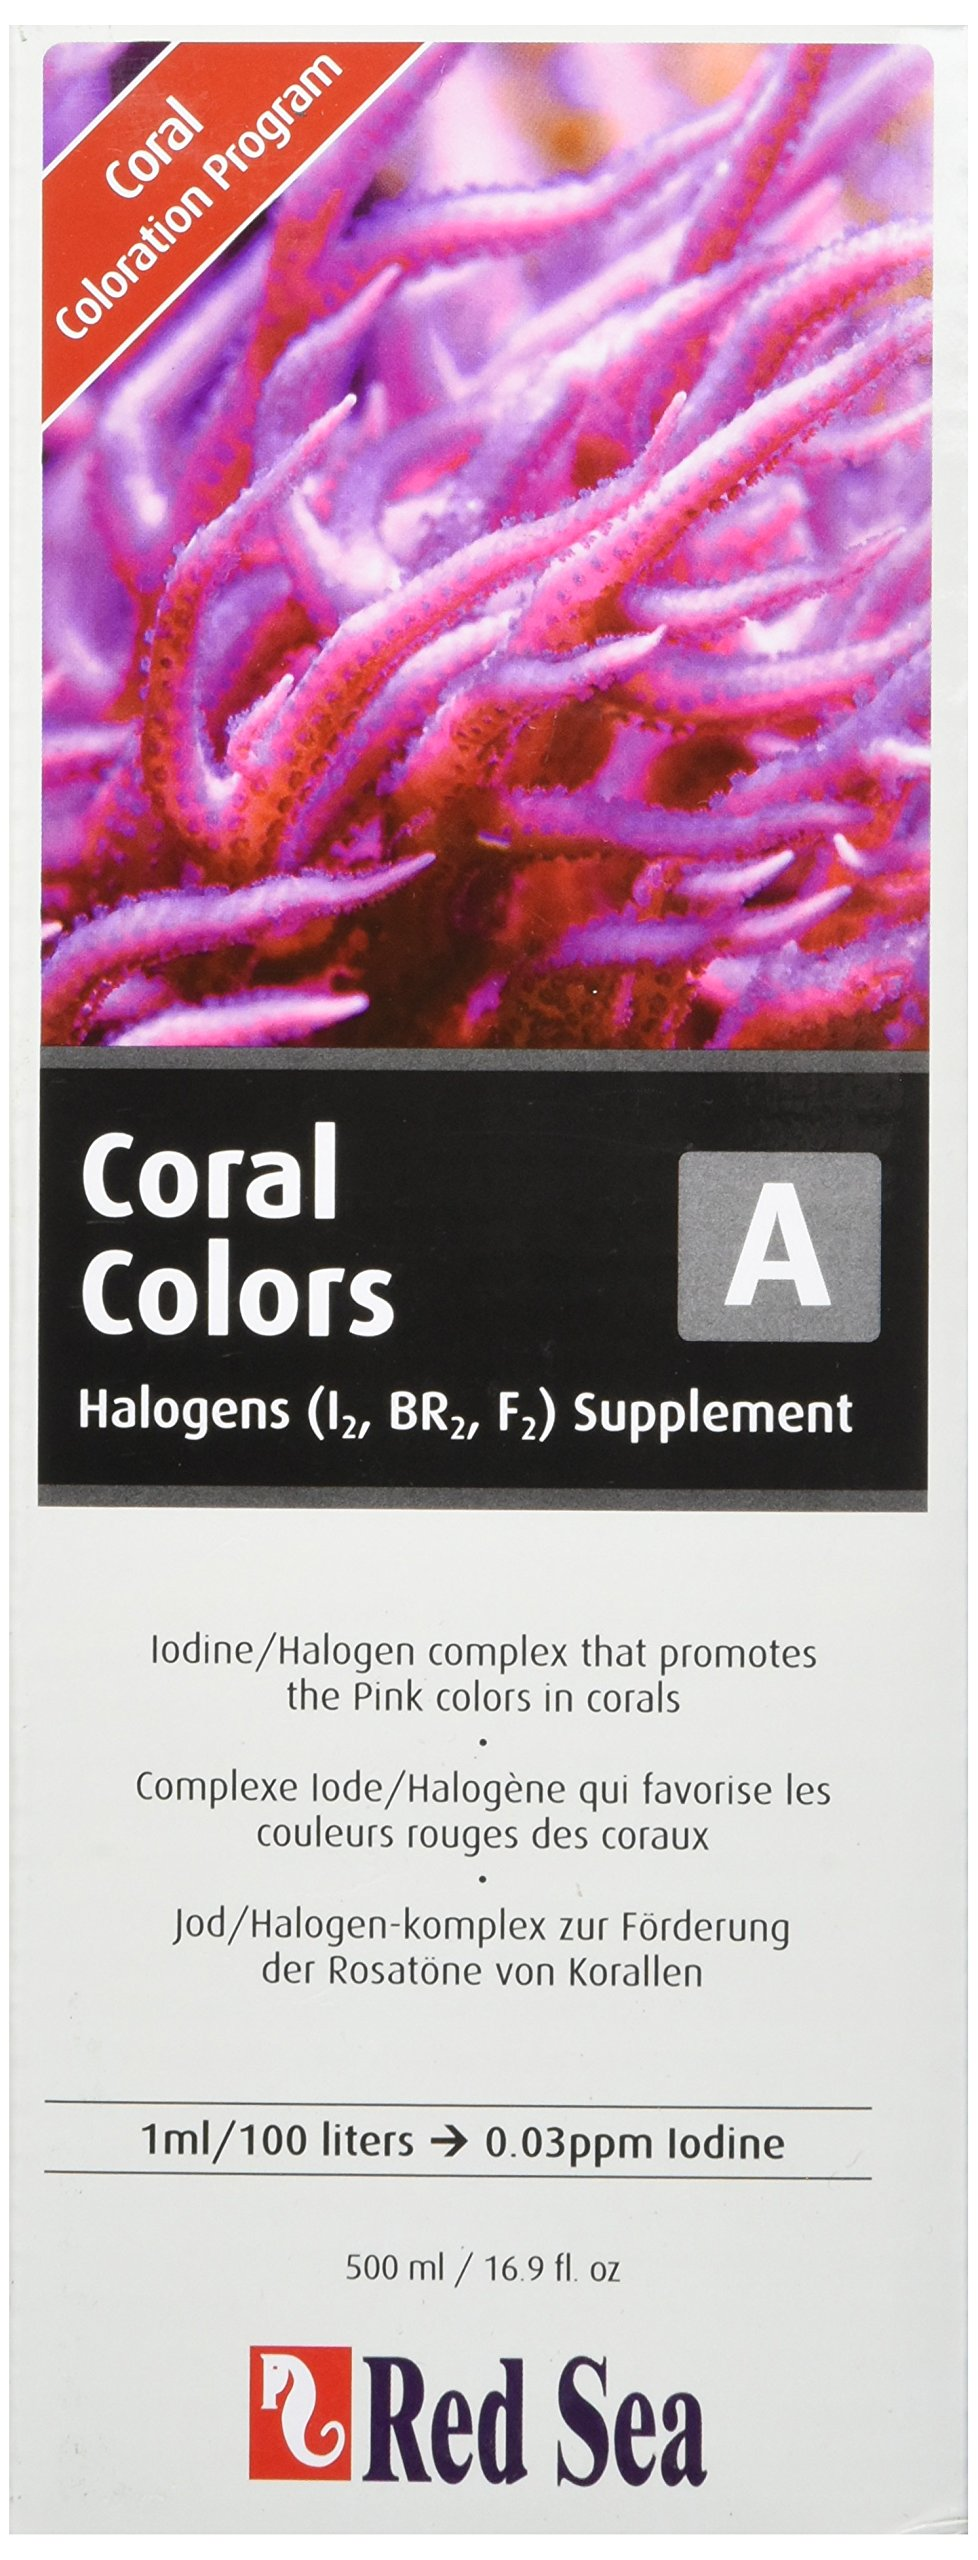 Red Sea Fish Pharm ARE22043 Reef Colors Iodine/Halogens Supplement-A for Aquarium, 500ml